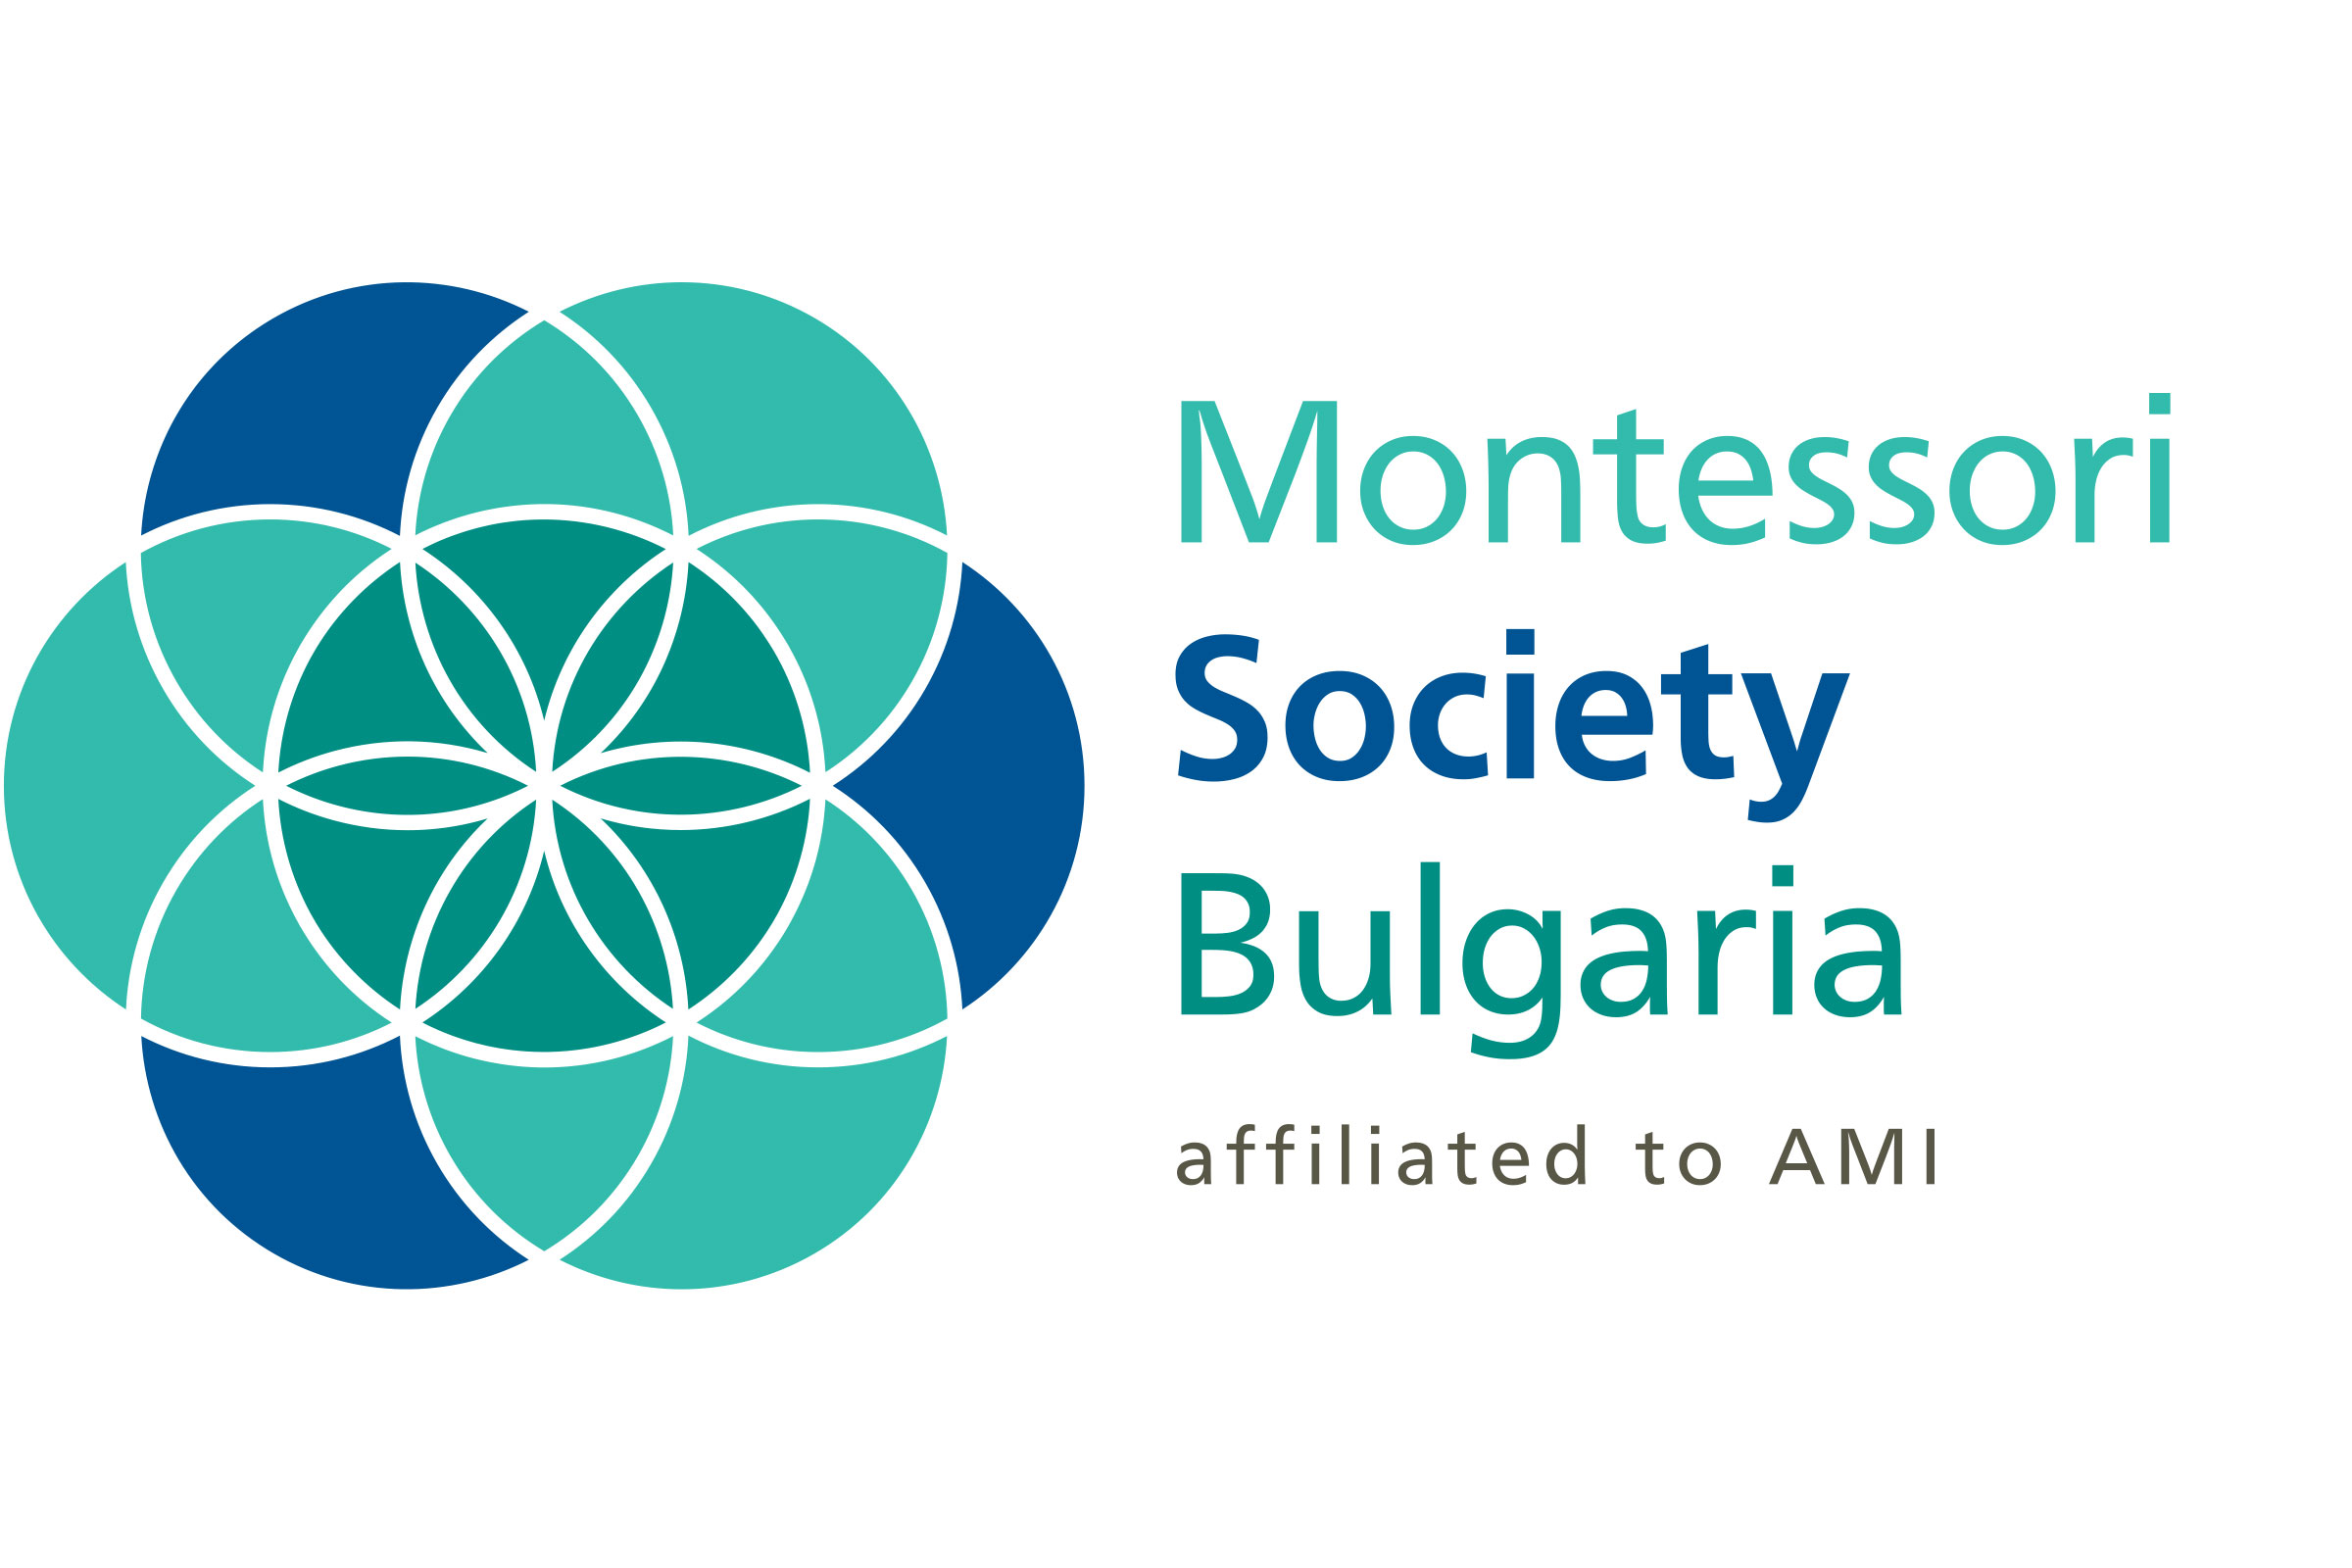 Montessori Society Bulgaria logo